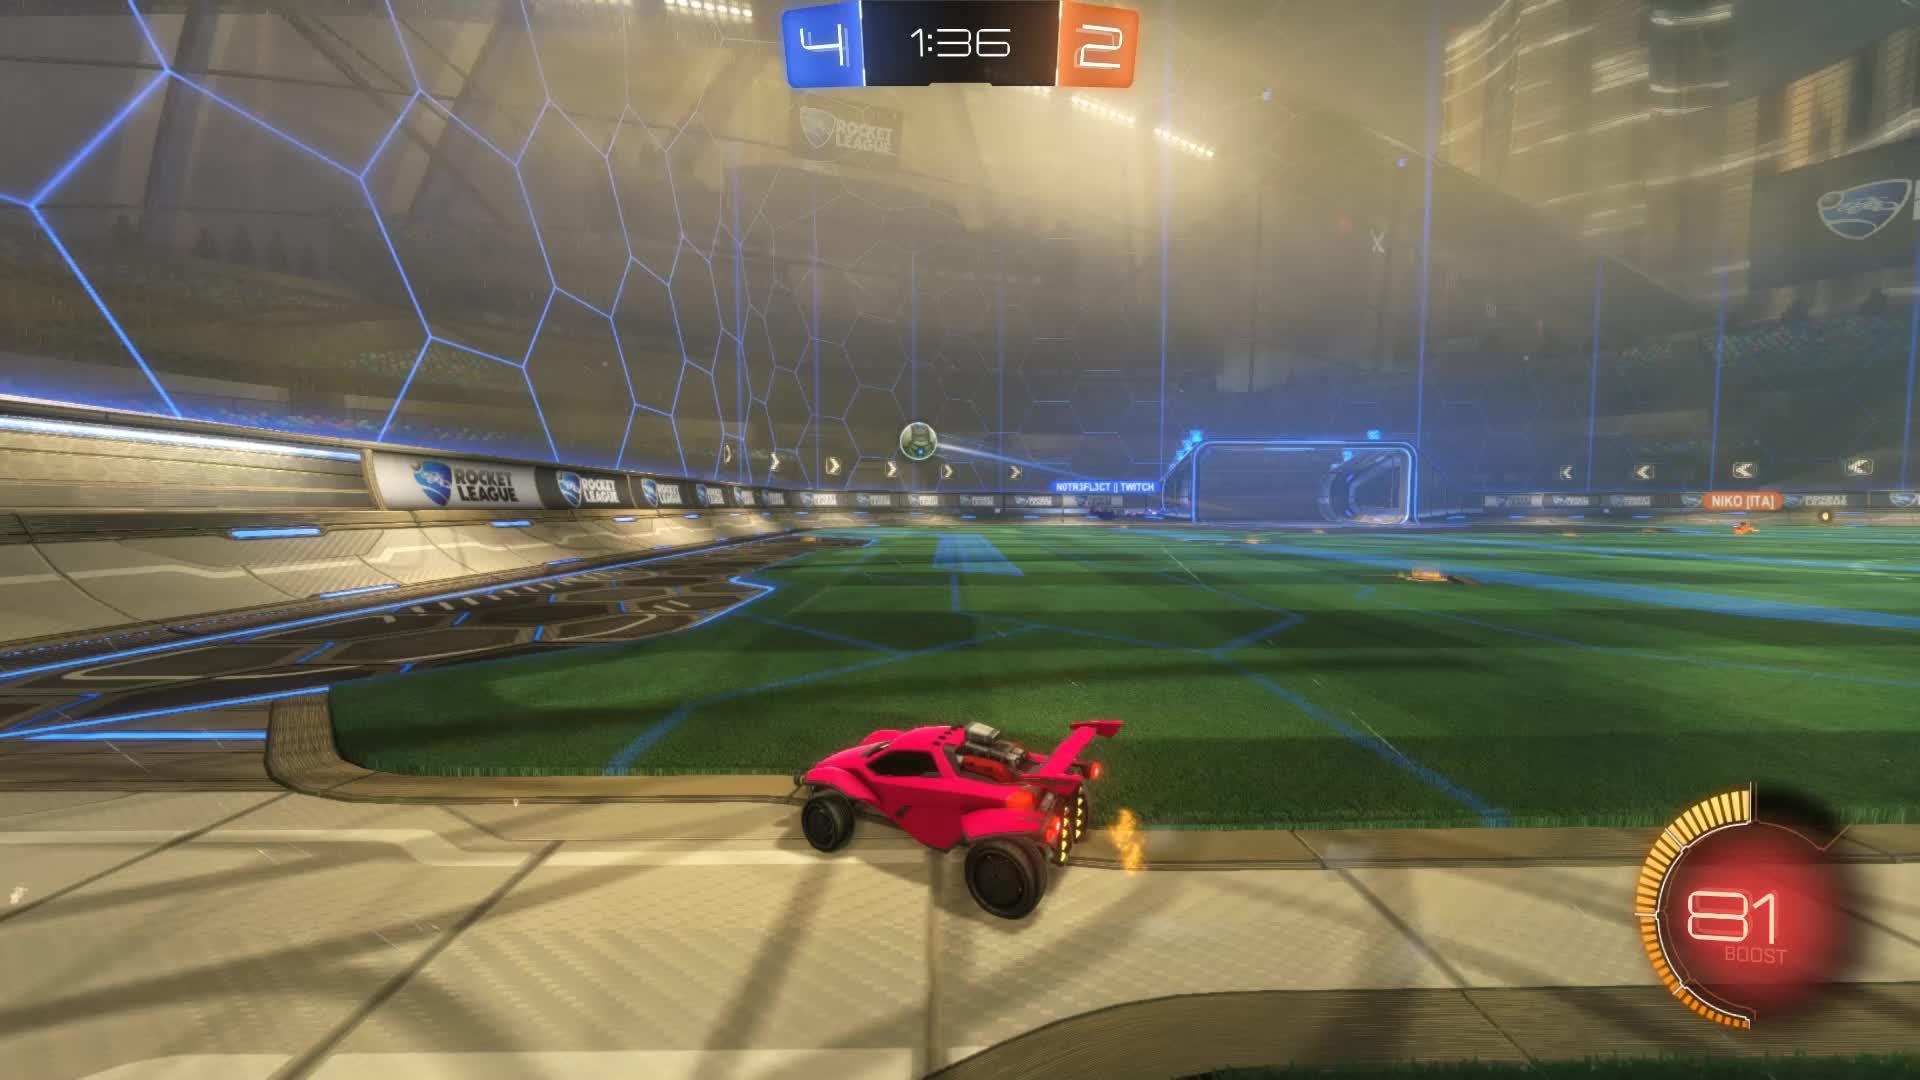 Gif Your Game, GifYourGame, Goal, JAG, Rocket League, RocketLeague, Goal 7: JAG GIFs